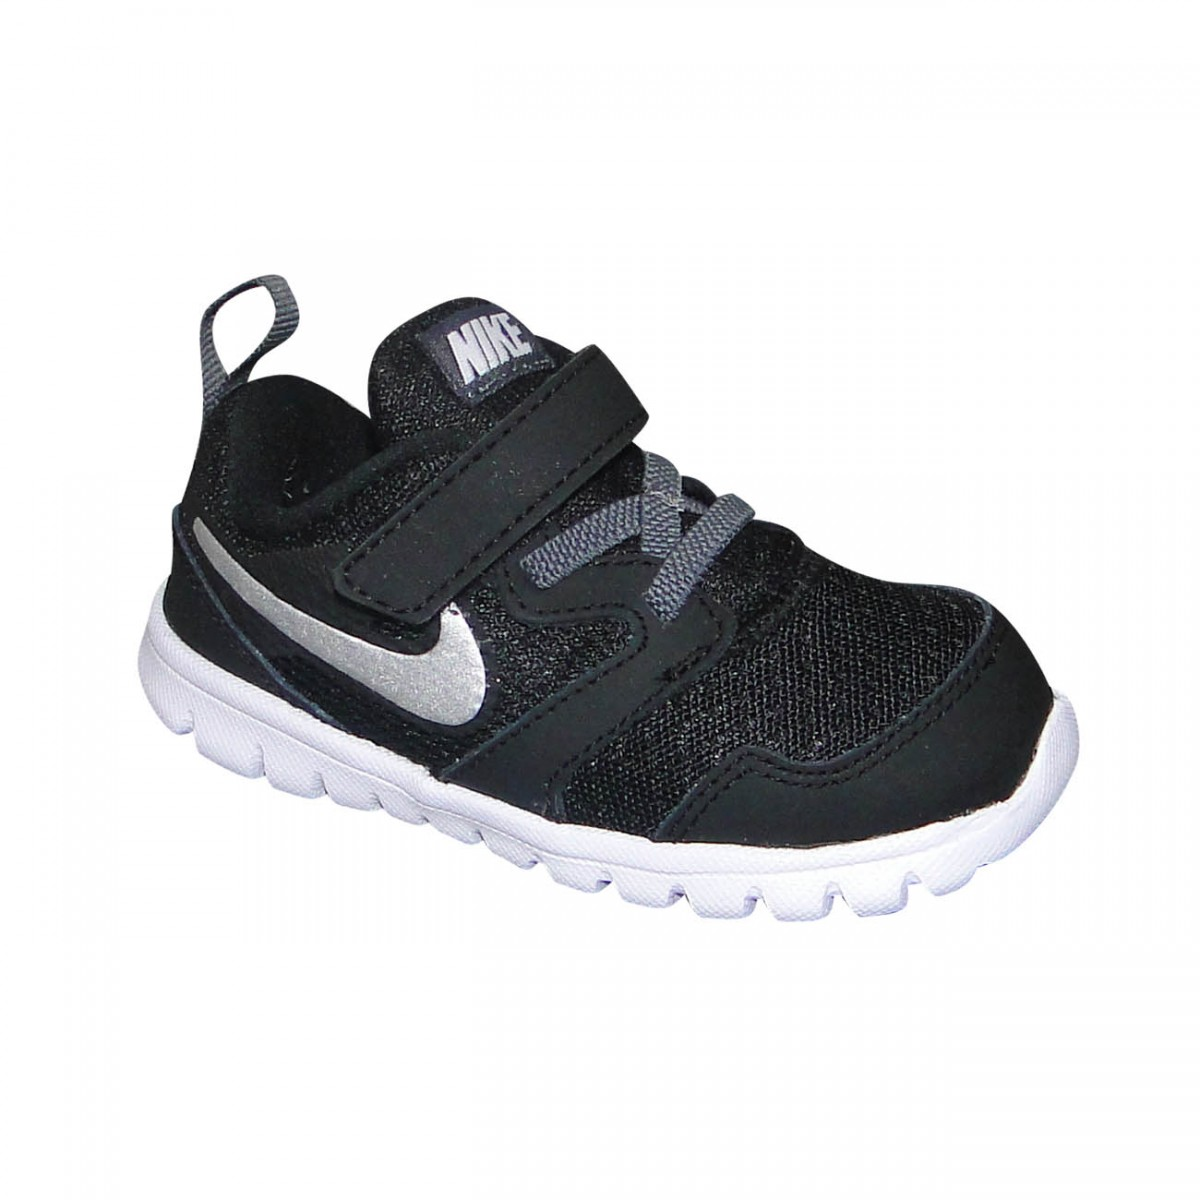 c625830e44b8f Tenis Nike Experience 3 Infantil 653703 001 - Preto/Branco - Chuteira Nike,  Adidas. Sandalias Femininas. Sandy Calçados